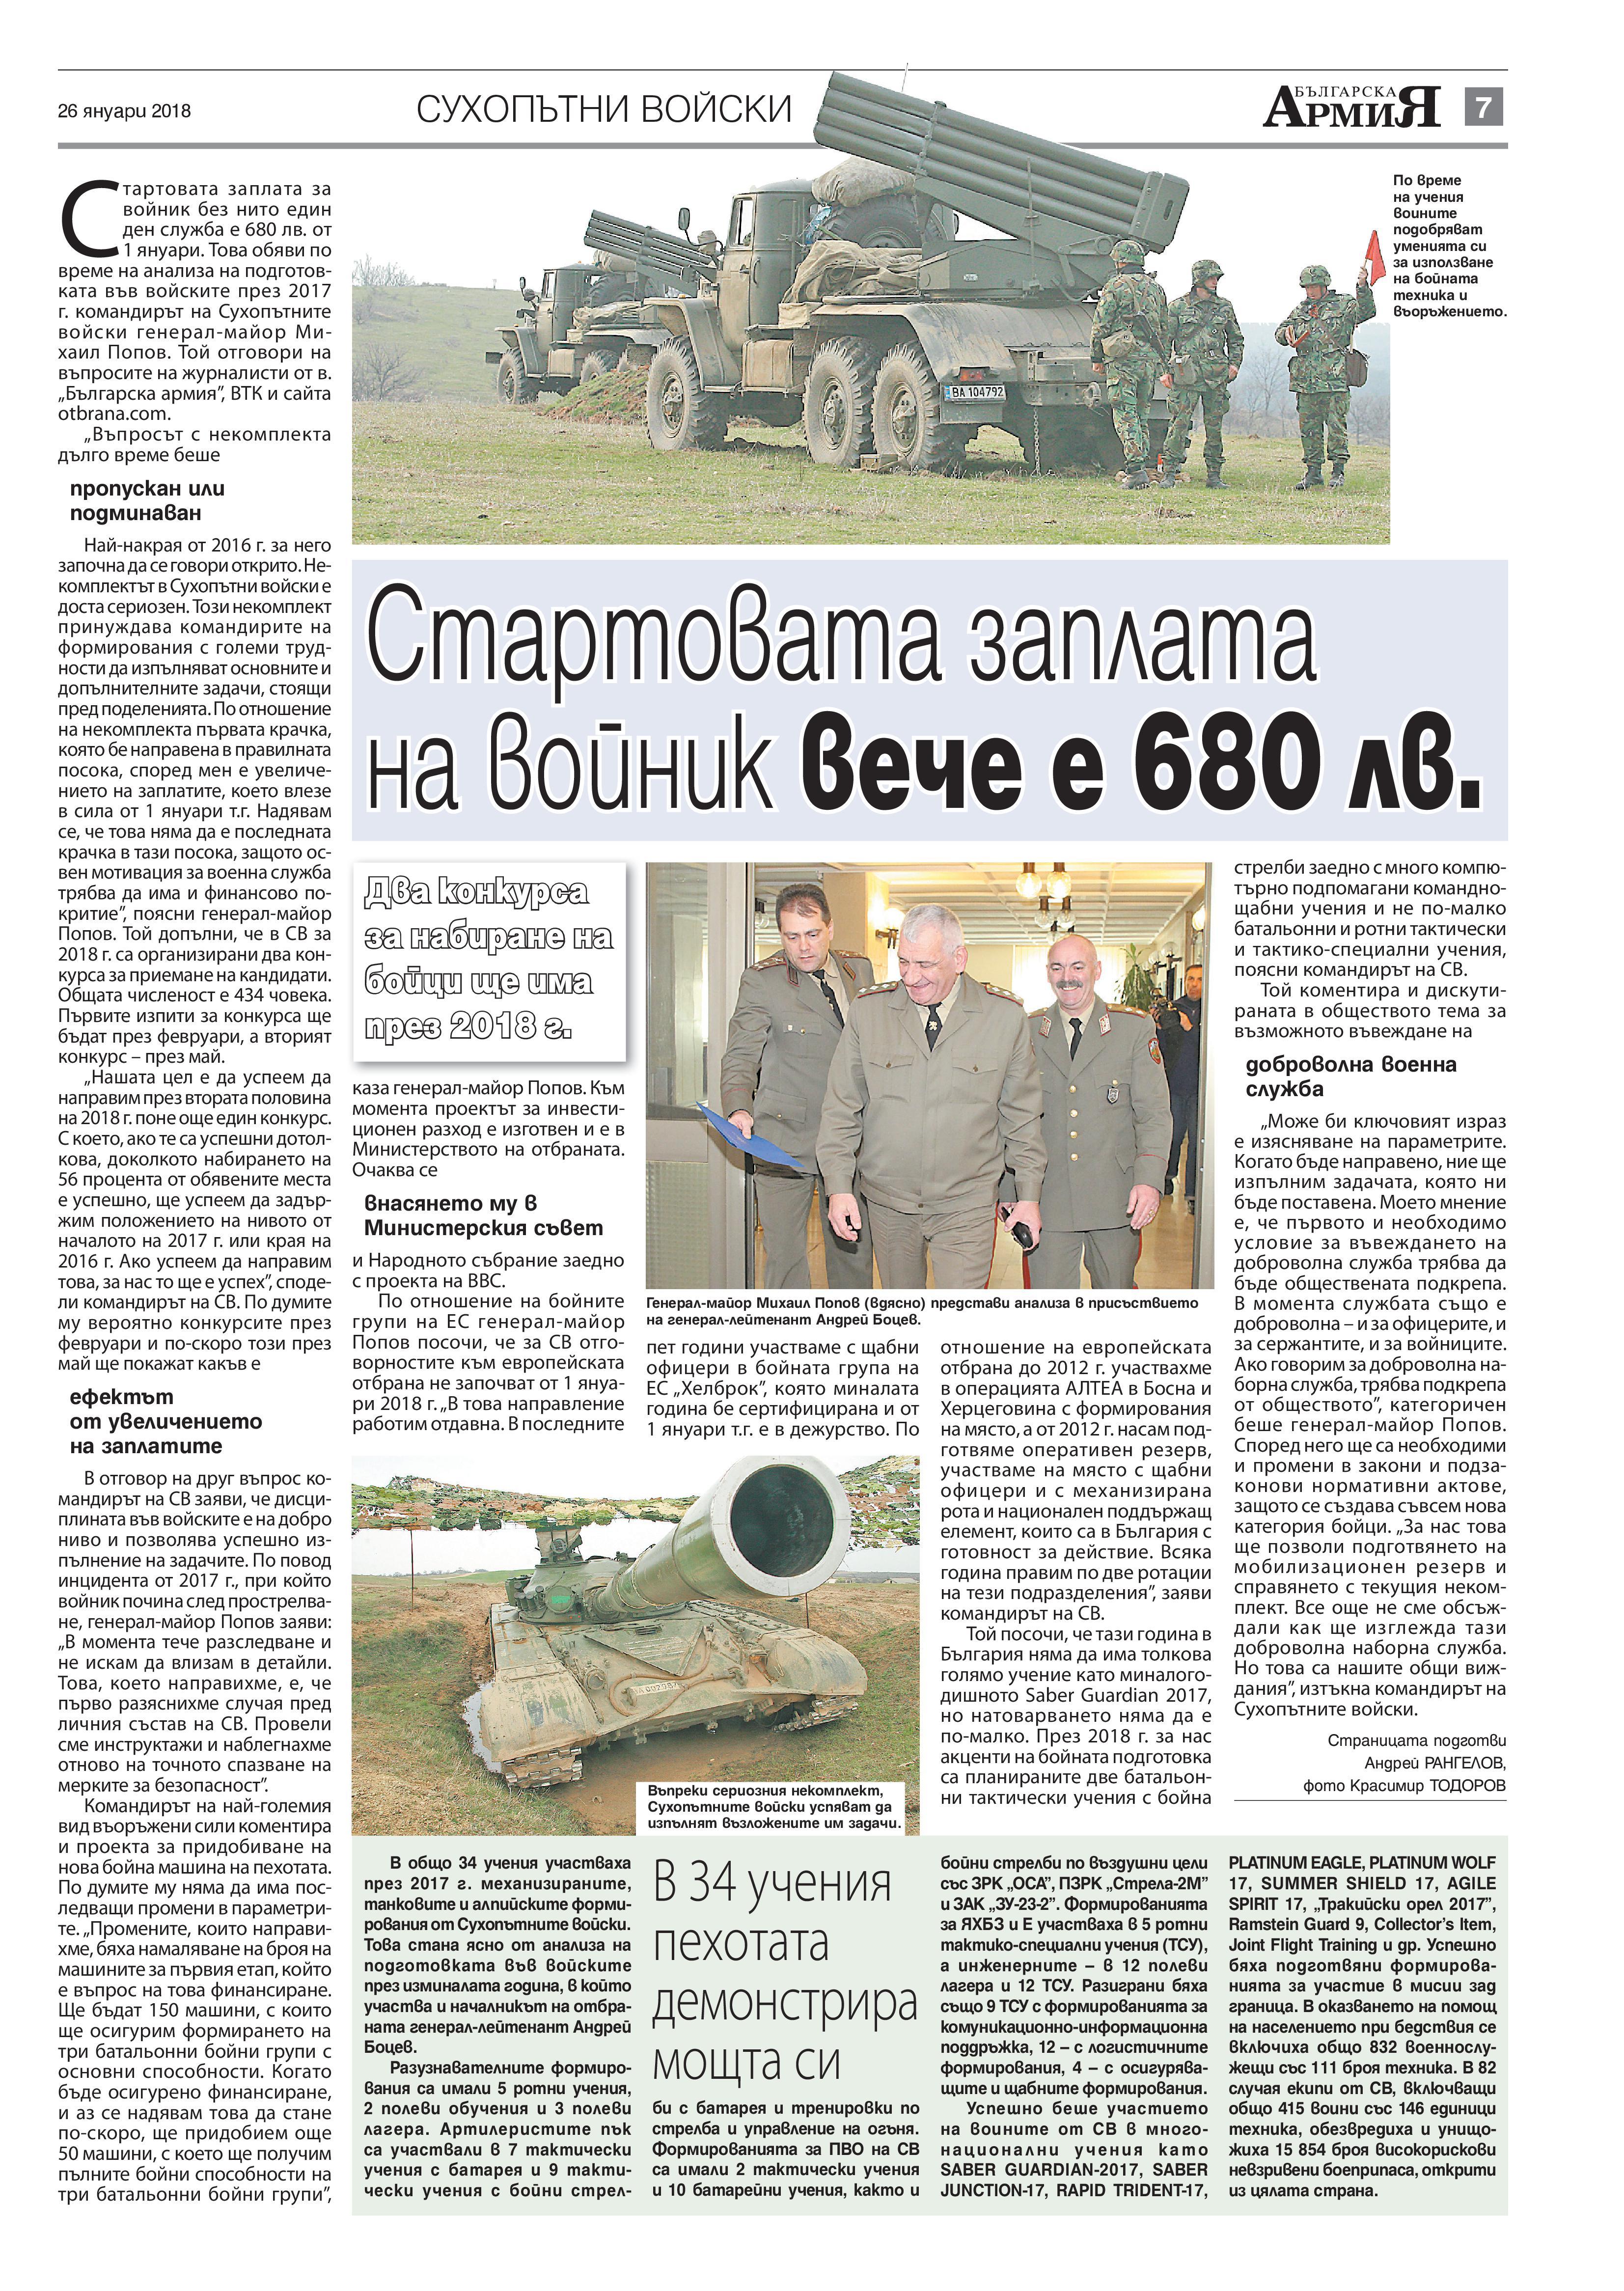 https://armymedia.bg/wp-content/uploads/2015/06/07-17.jpg